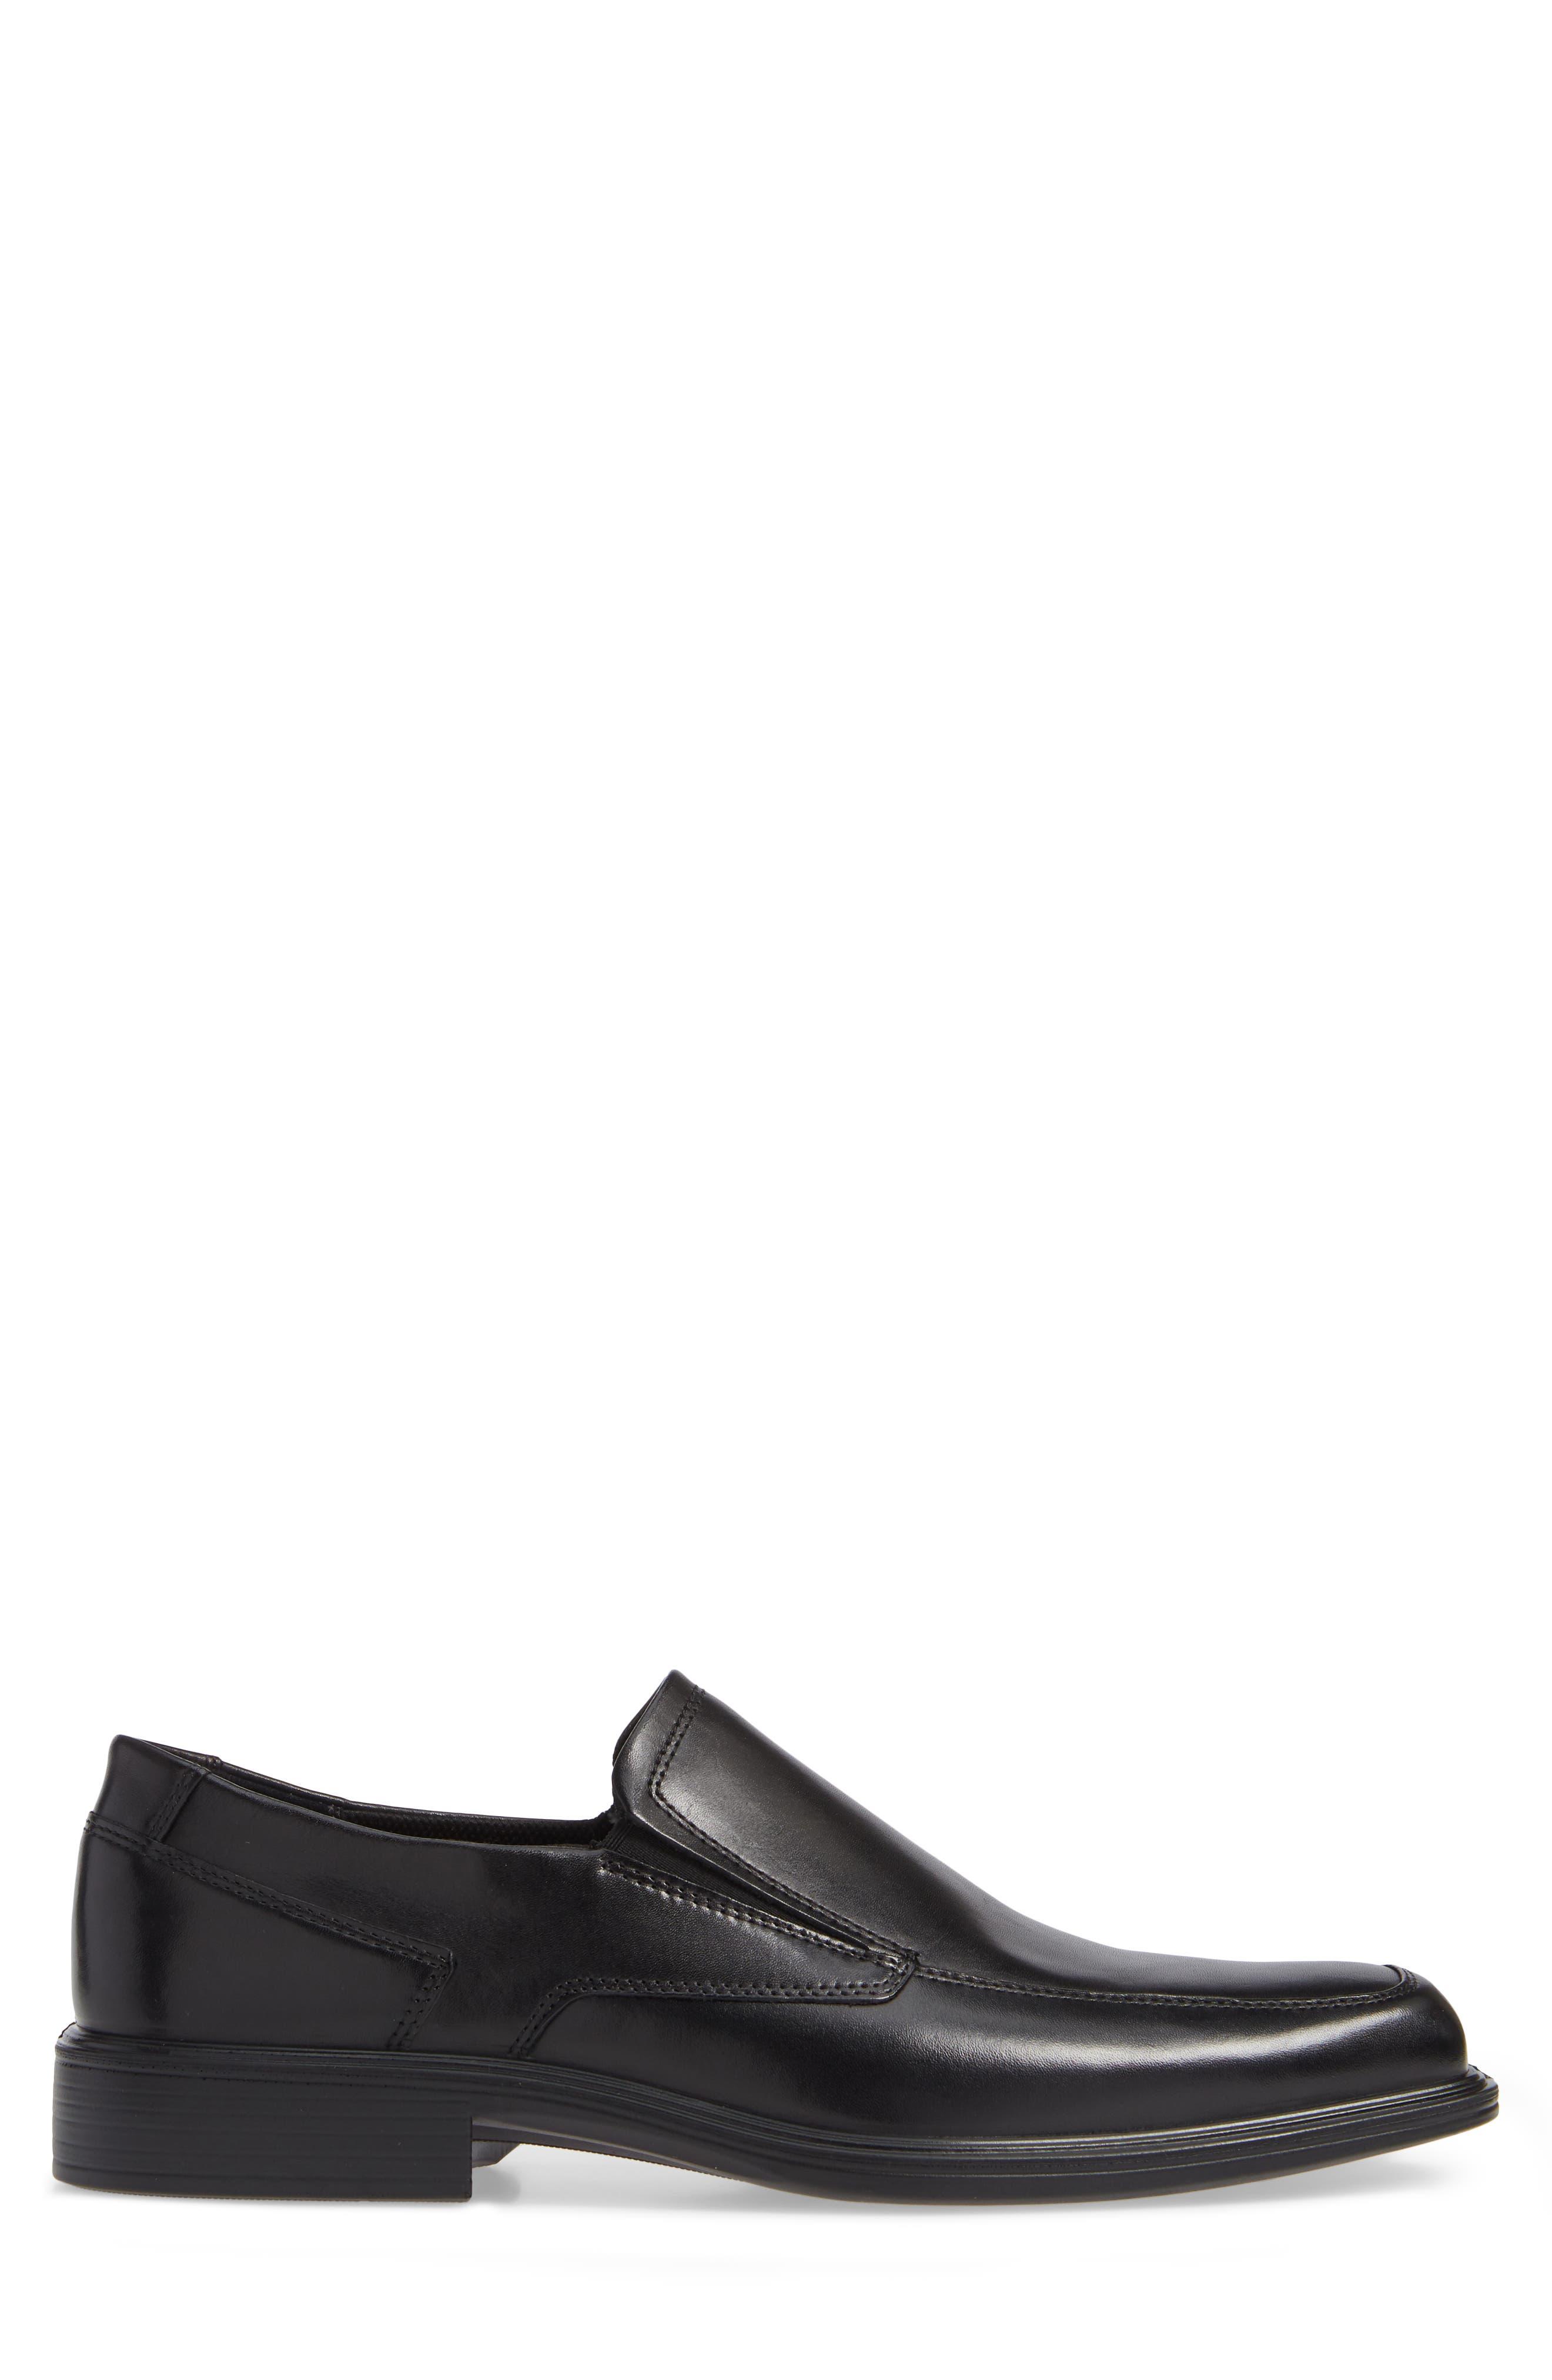 Minneapolis Venetian Loafer,                             Alternate thumbnail 3, color,                             BLACK/BLACK LEATHER